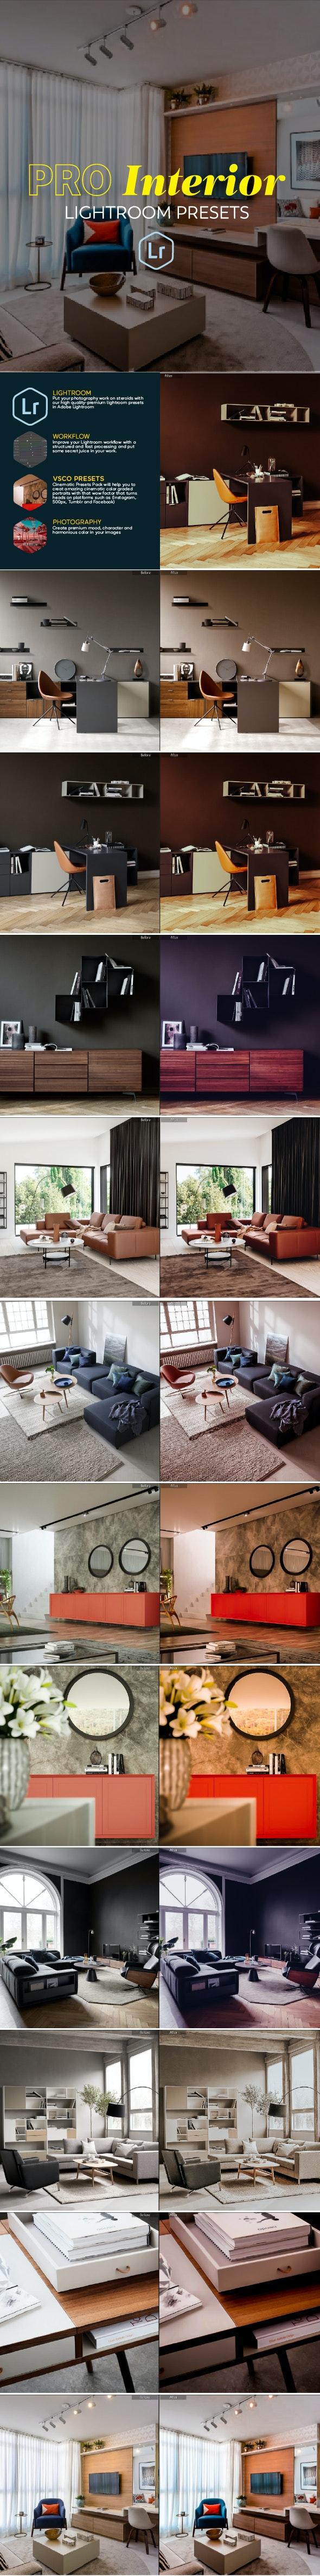 Pro Interior Lightroom Presets - Lightroom Presets Add-ons